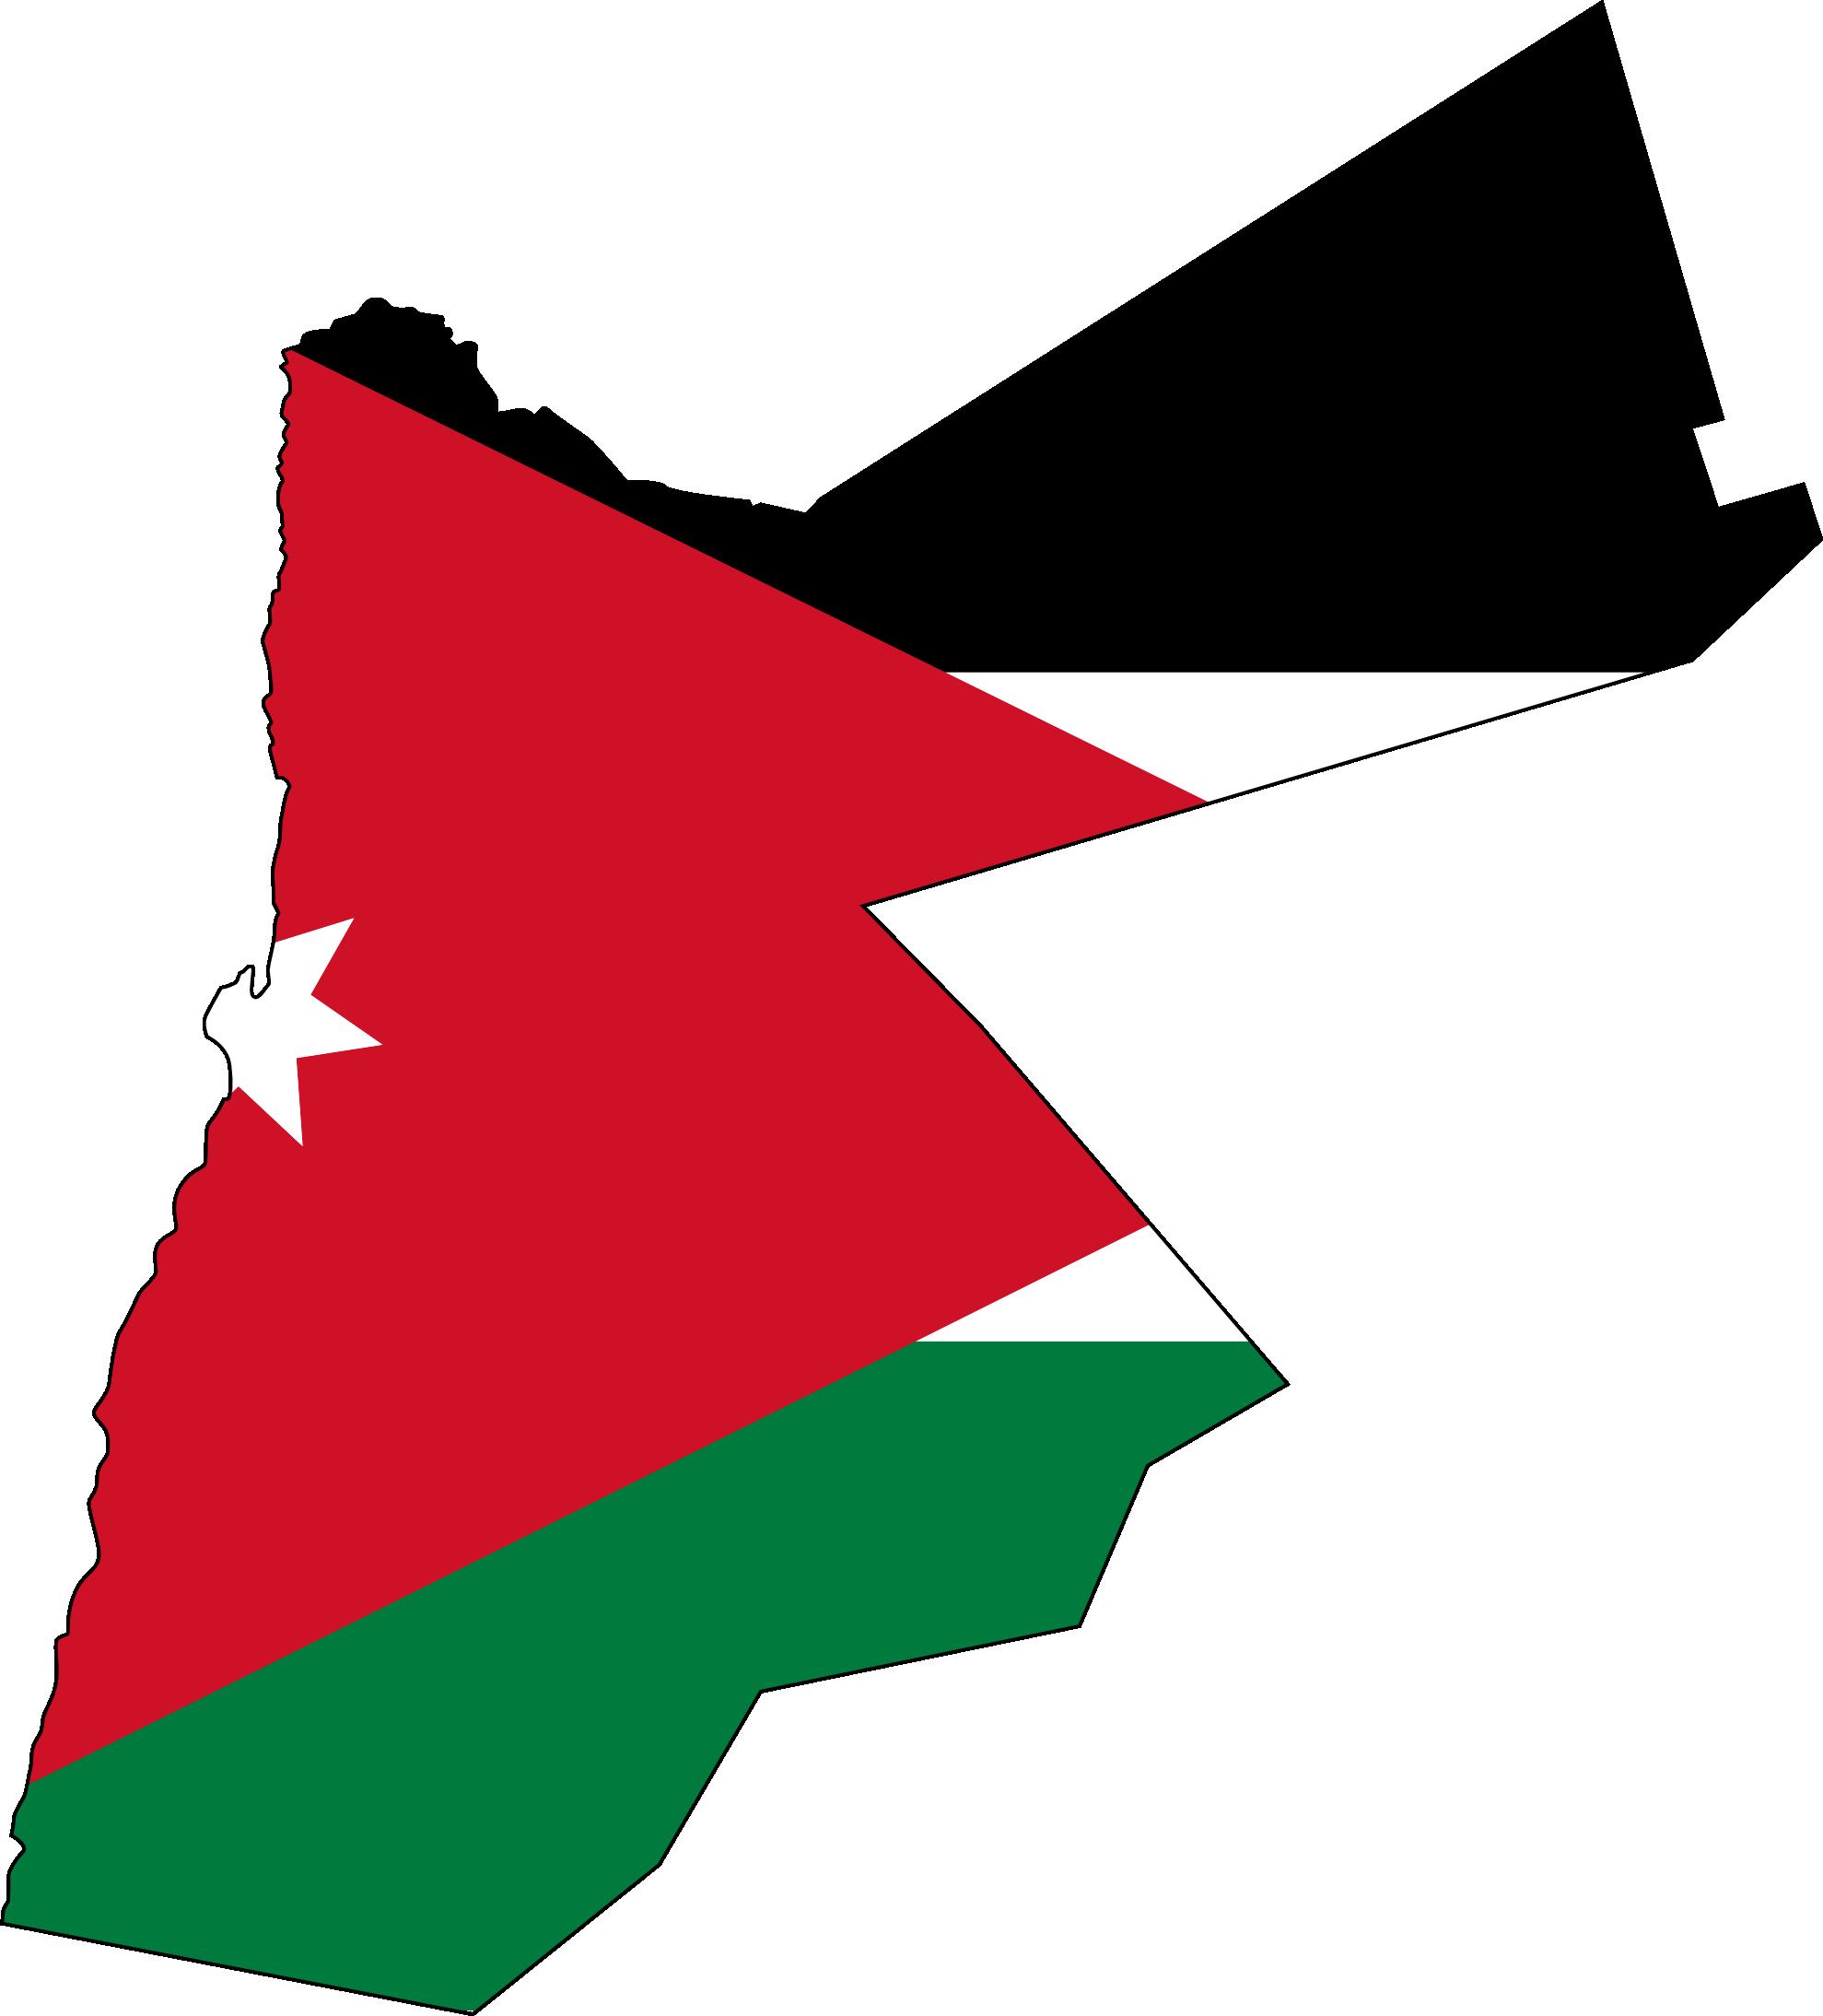 Jordania clipart Jordanian%20clipart 20clipart Panda Jordanian Images